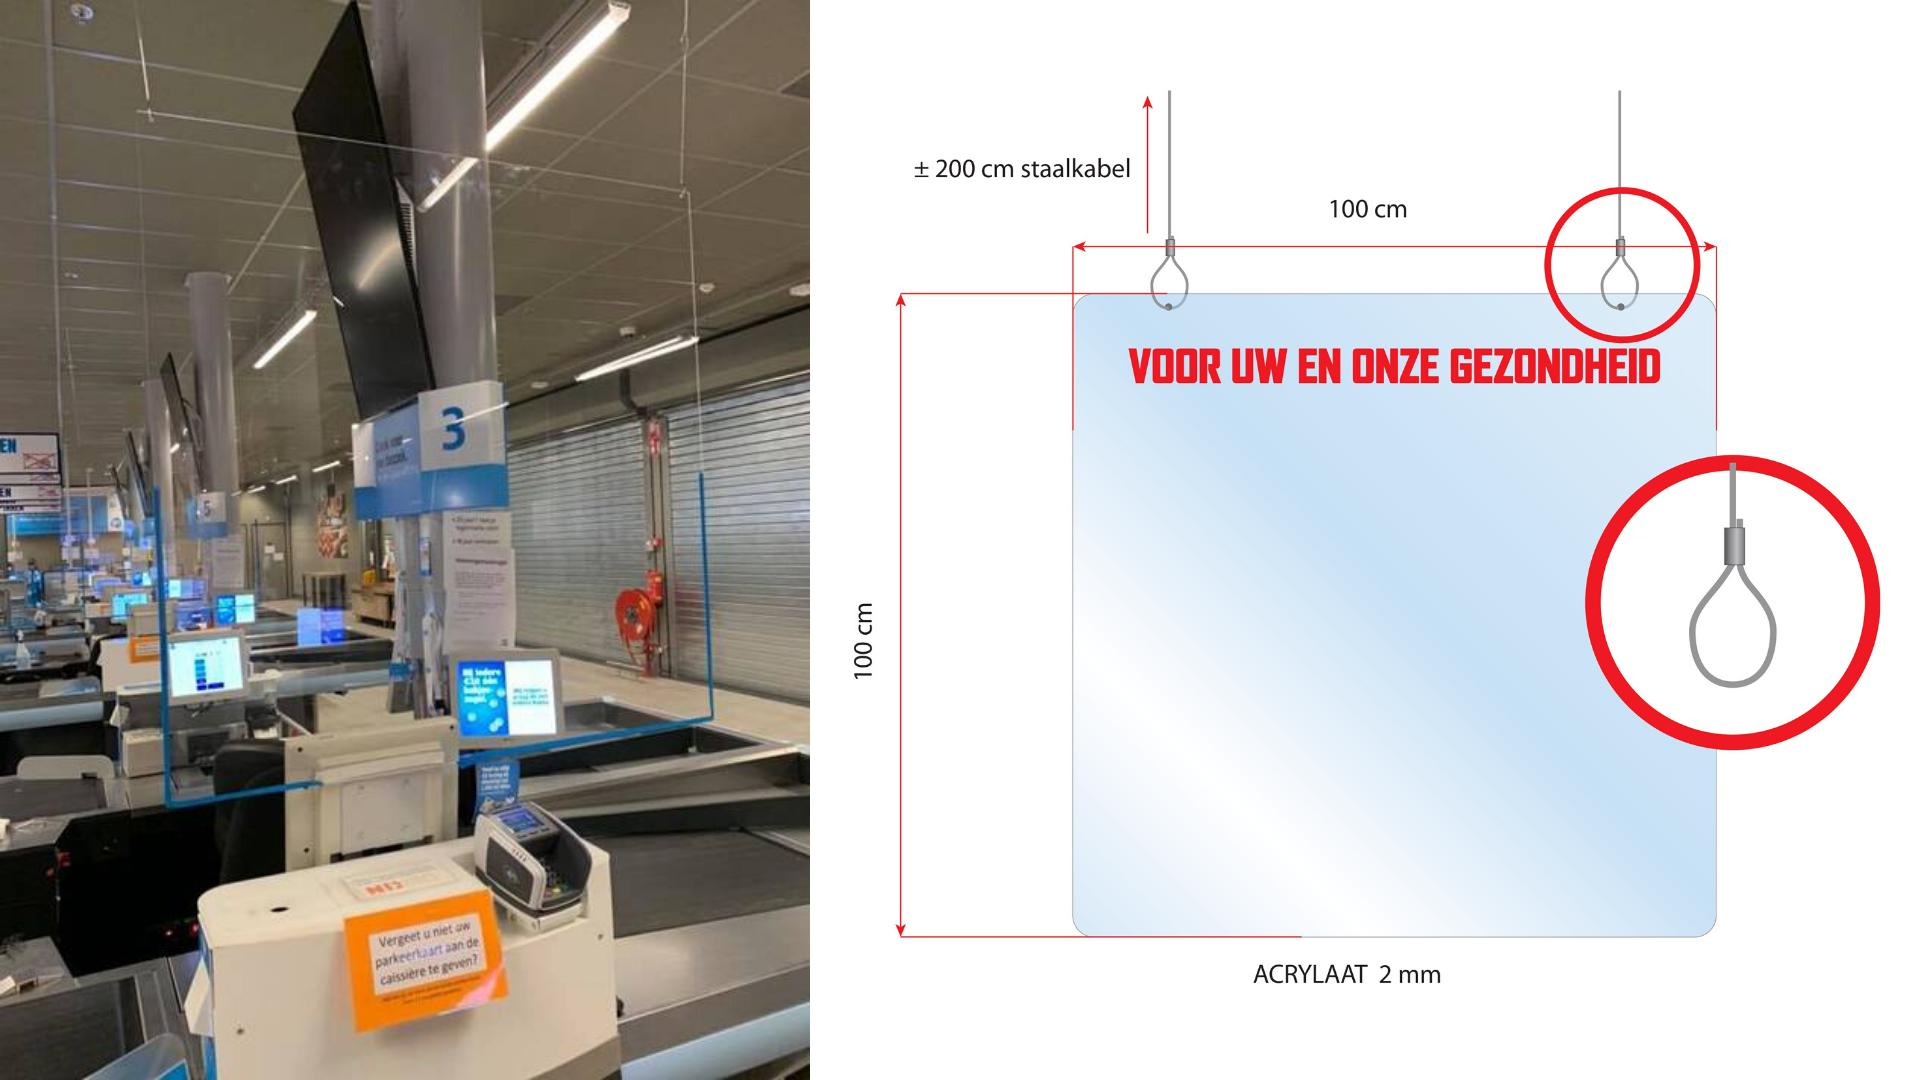 kassaschermen plexiglas schermen coronavirus spatscherm hangend FDS